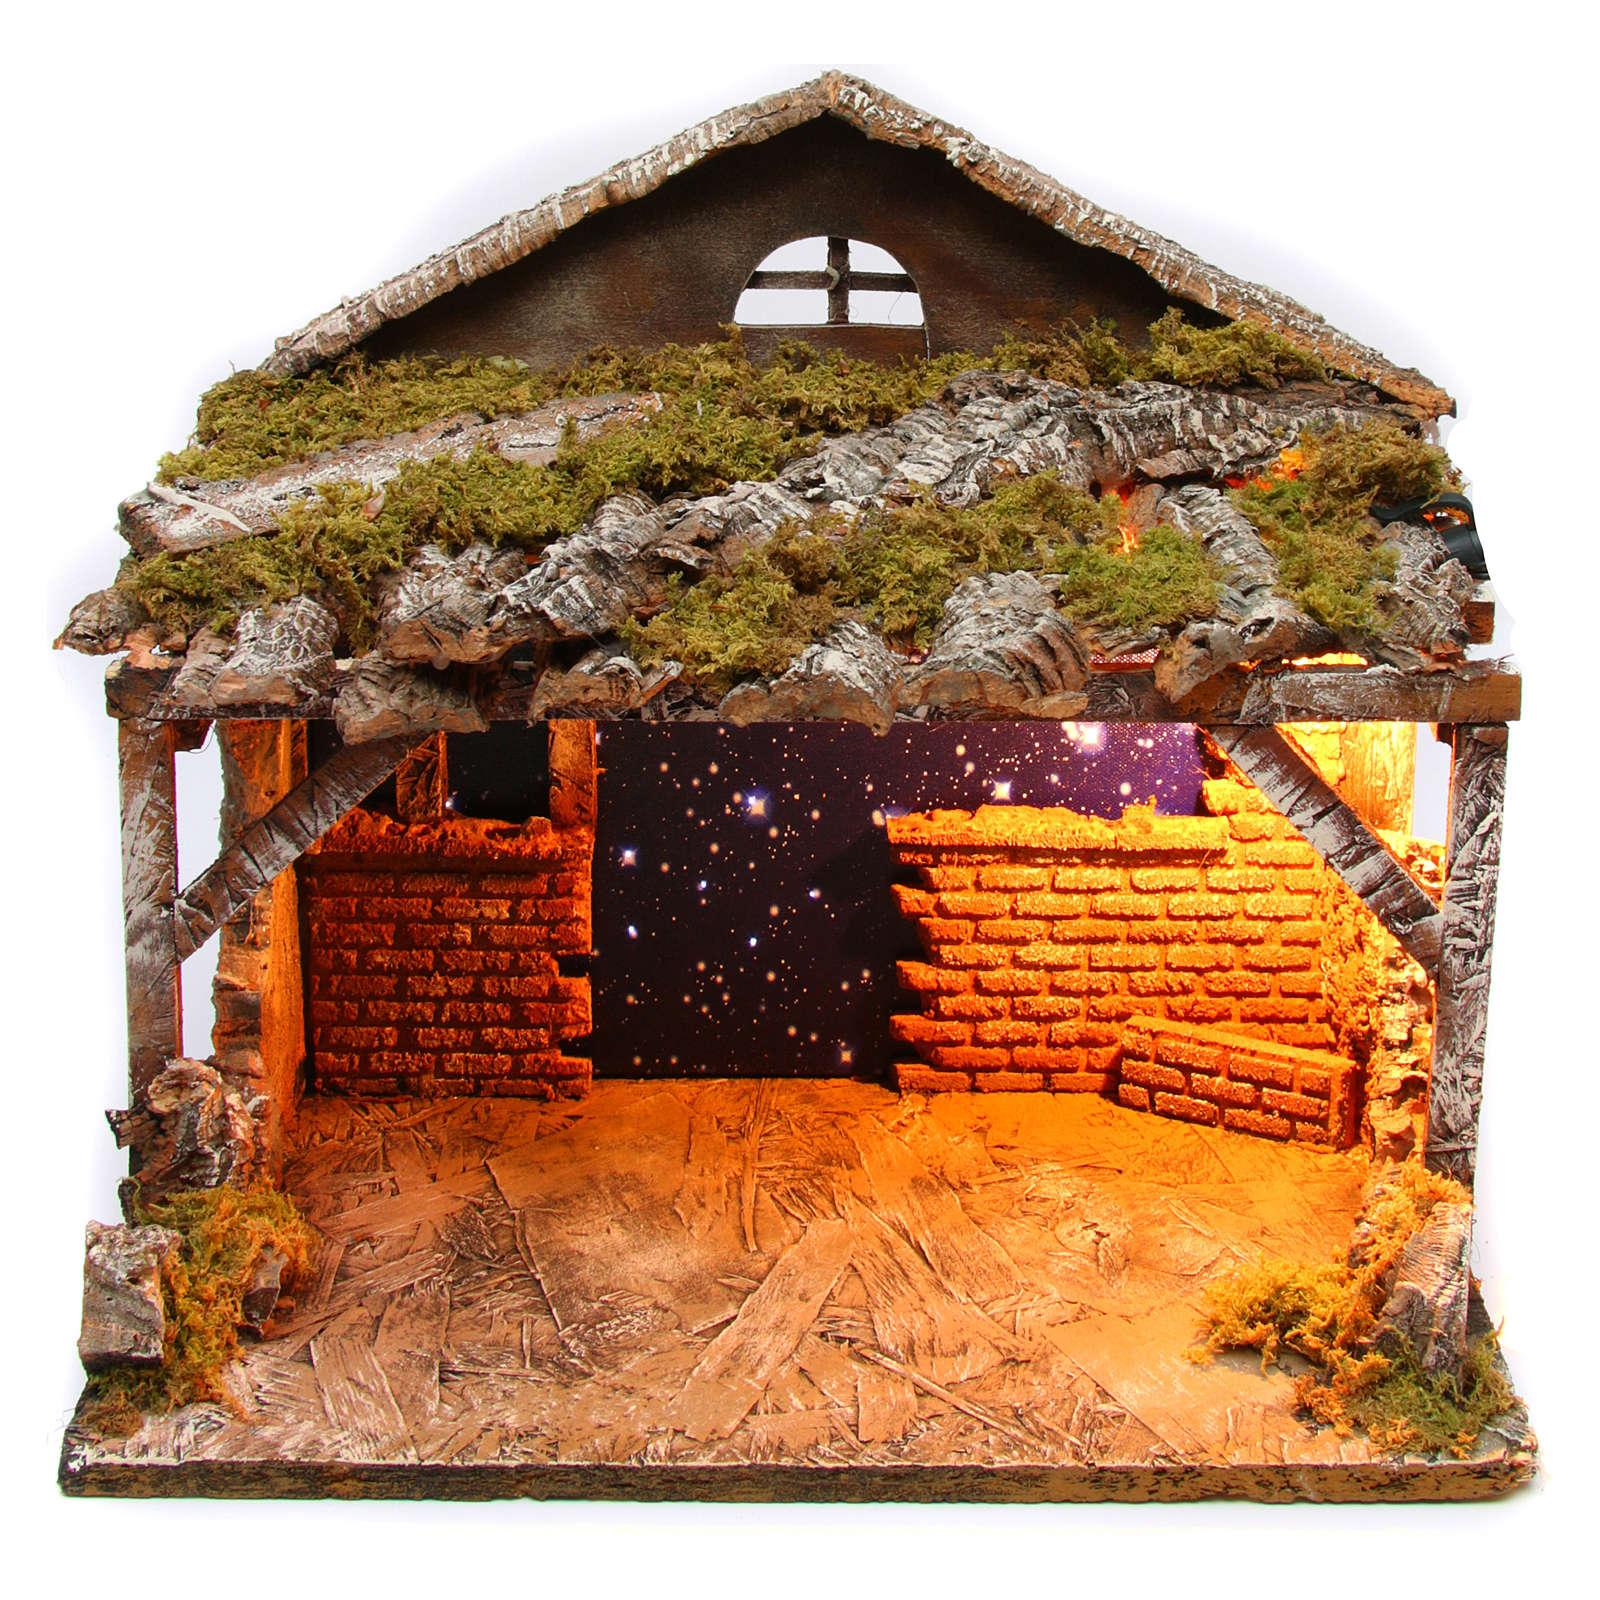 Stable with starry sky for Neapolitan Nativity Scene 25x35x25 cm 4